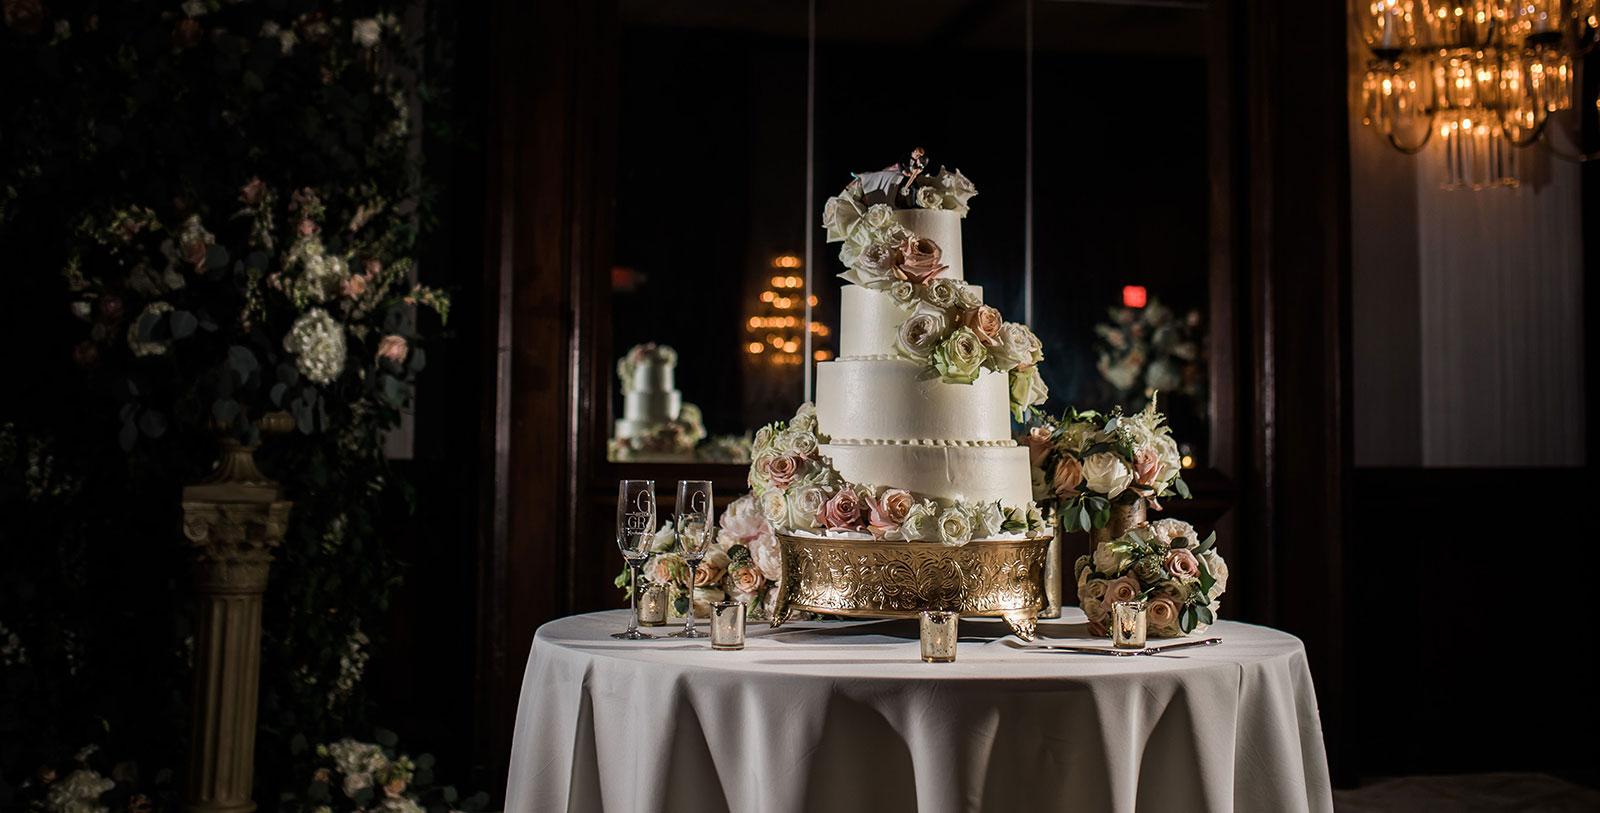 Image of Wedding Cake, The DeSoto, 1890, Member of Historic Hotels of America, in Savannah, Georgia, Weddings